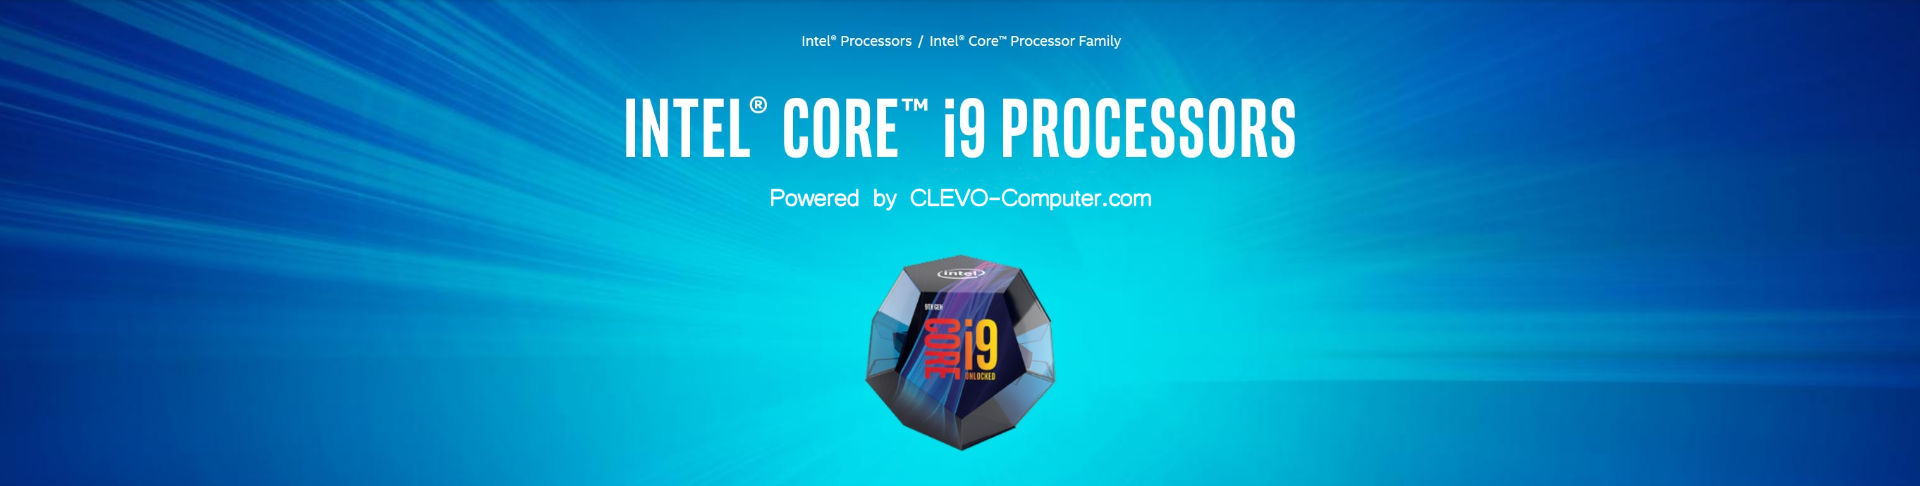 intel-9th-gen-core-i9-desktop-cpu-powered-by-clevo-computer